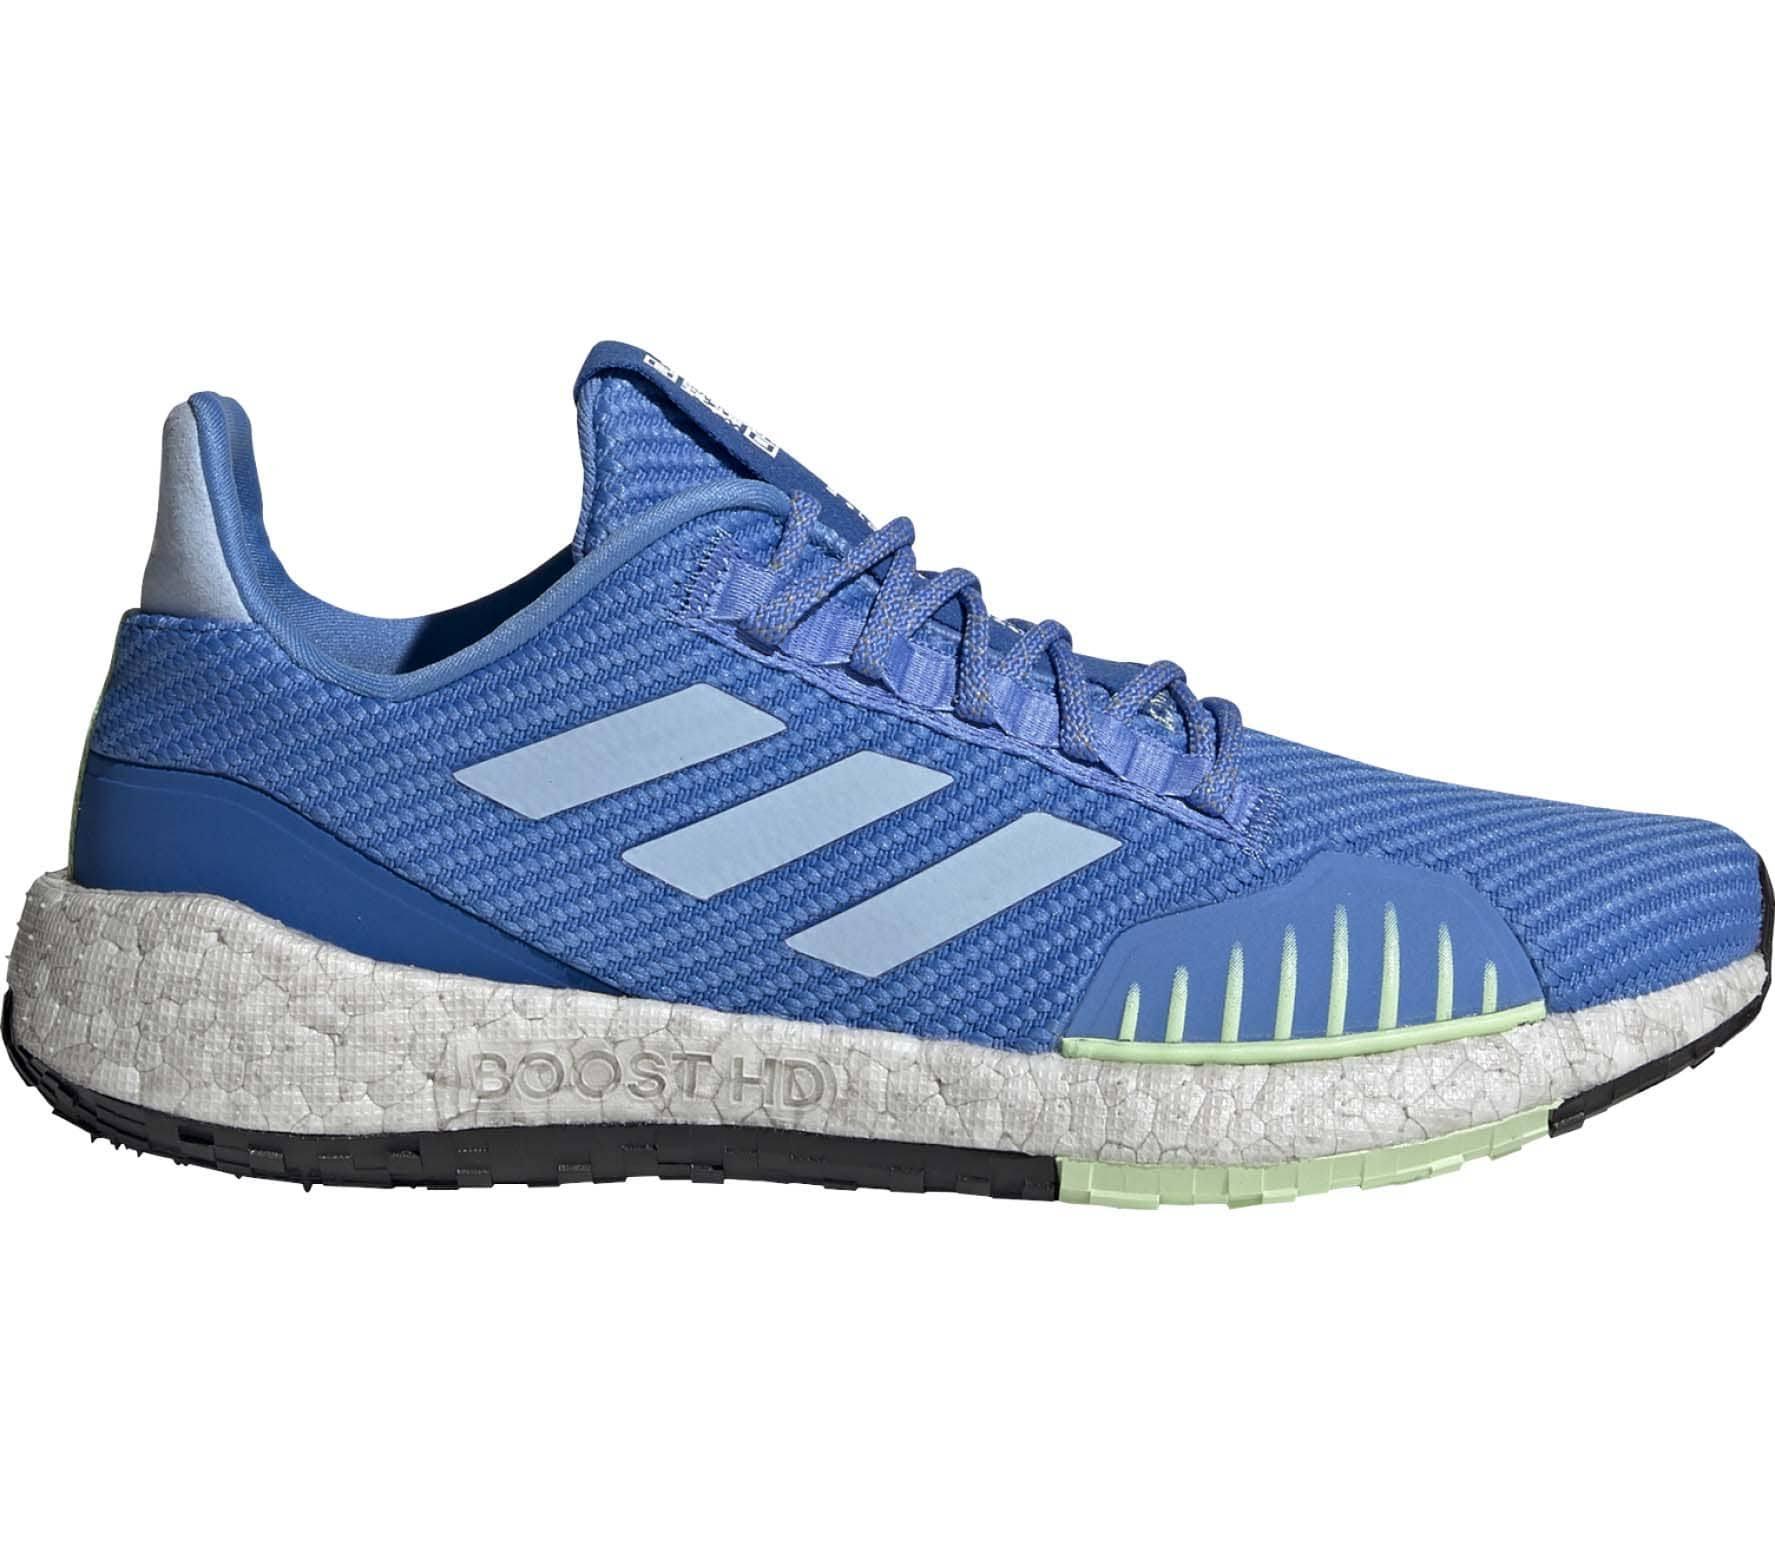 Adidas Pulseboost HD Women Running Shoes Blue